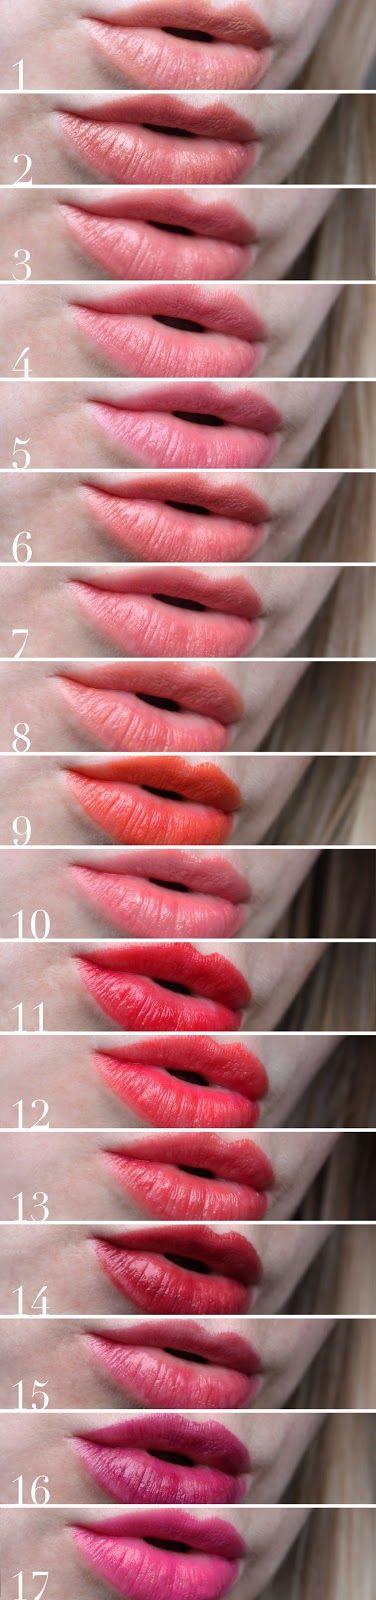 ALABASTER MAEDCHEN: ILIA Beauty Swatches Tinted Lip Conditioners & Lipsticks #lipstickswatches #iliabeauty #makeup